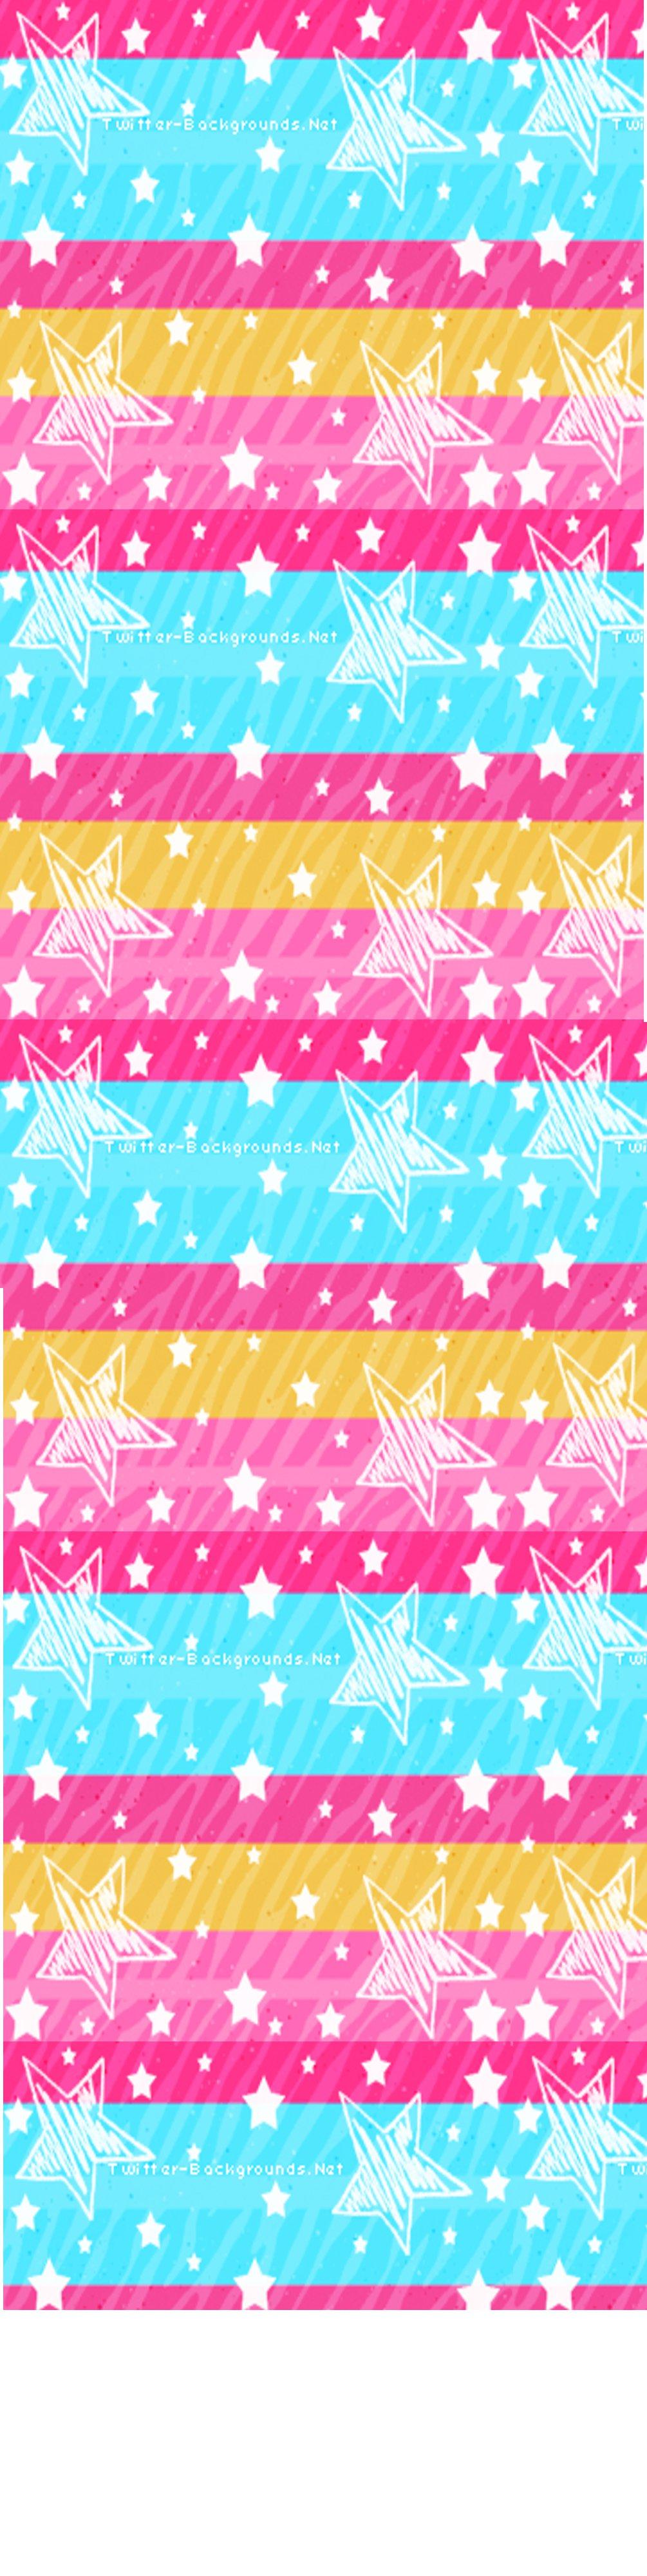 Lisa Franky Background   Lisa Fr 1005x4000